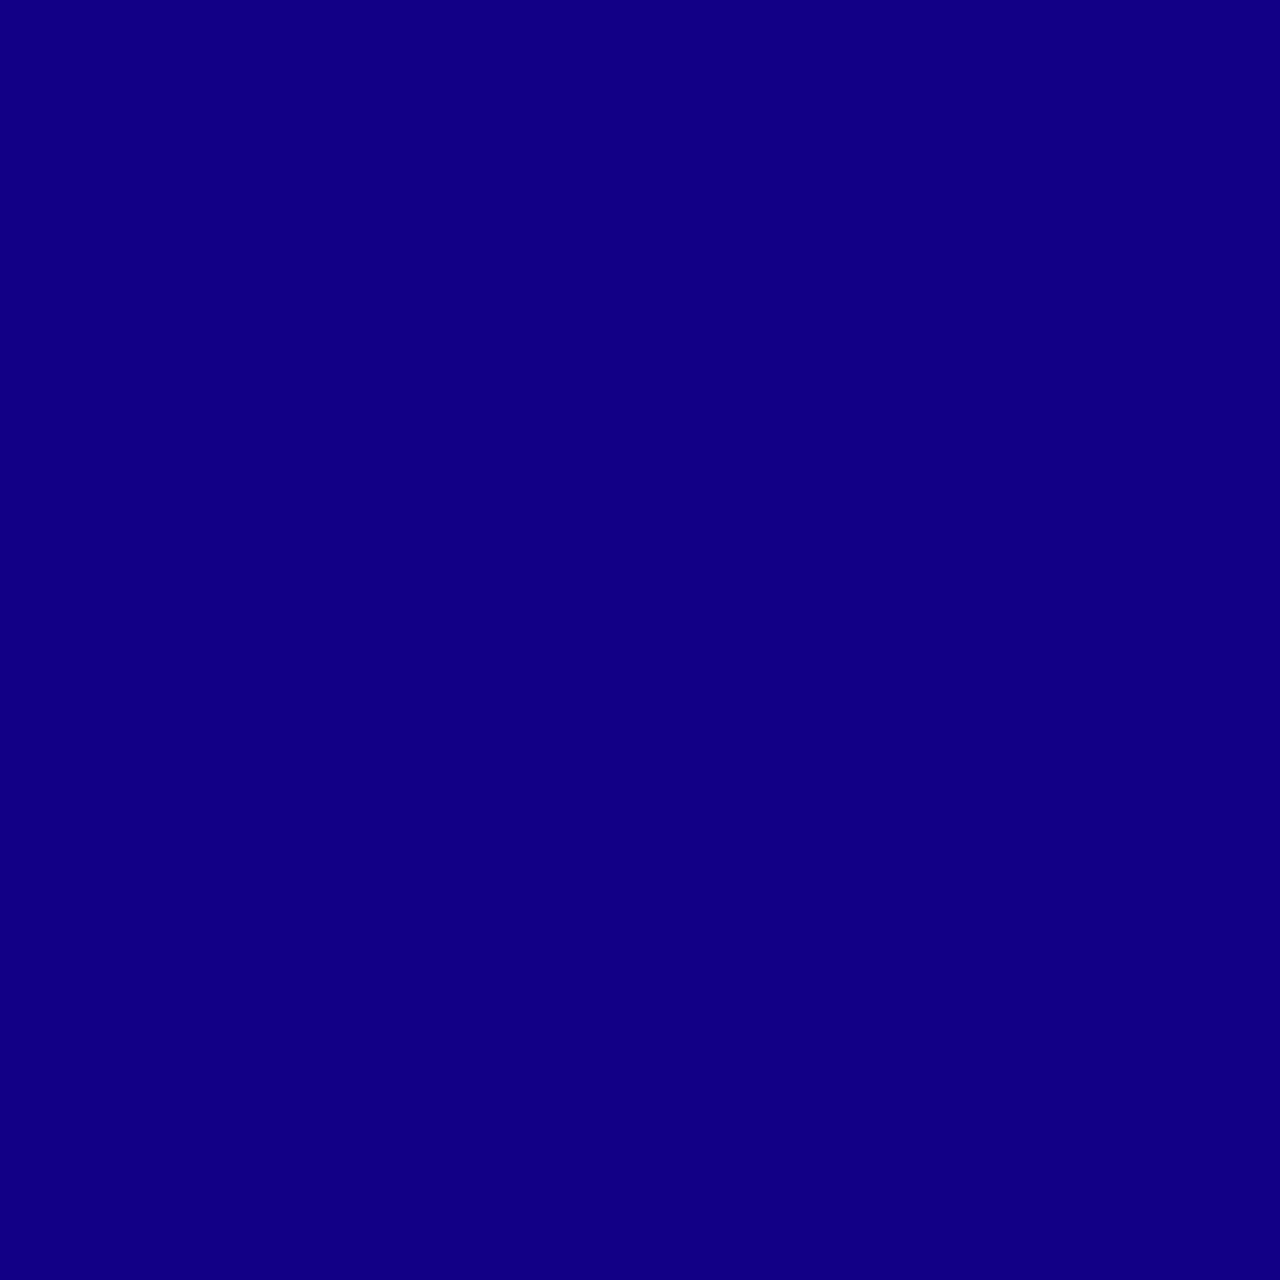 Алюкобонд тёмно-синий 8827 (3мм/18мкм) 1,22мХ2,44м